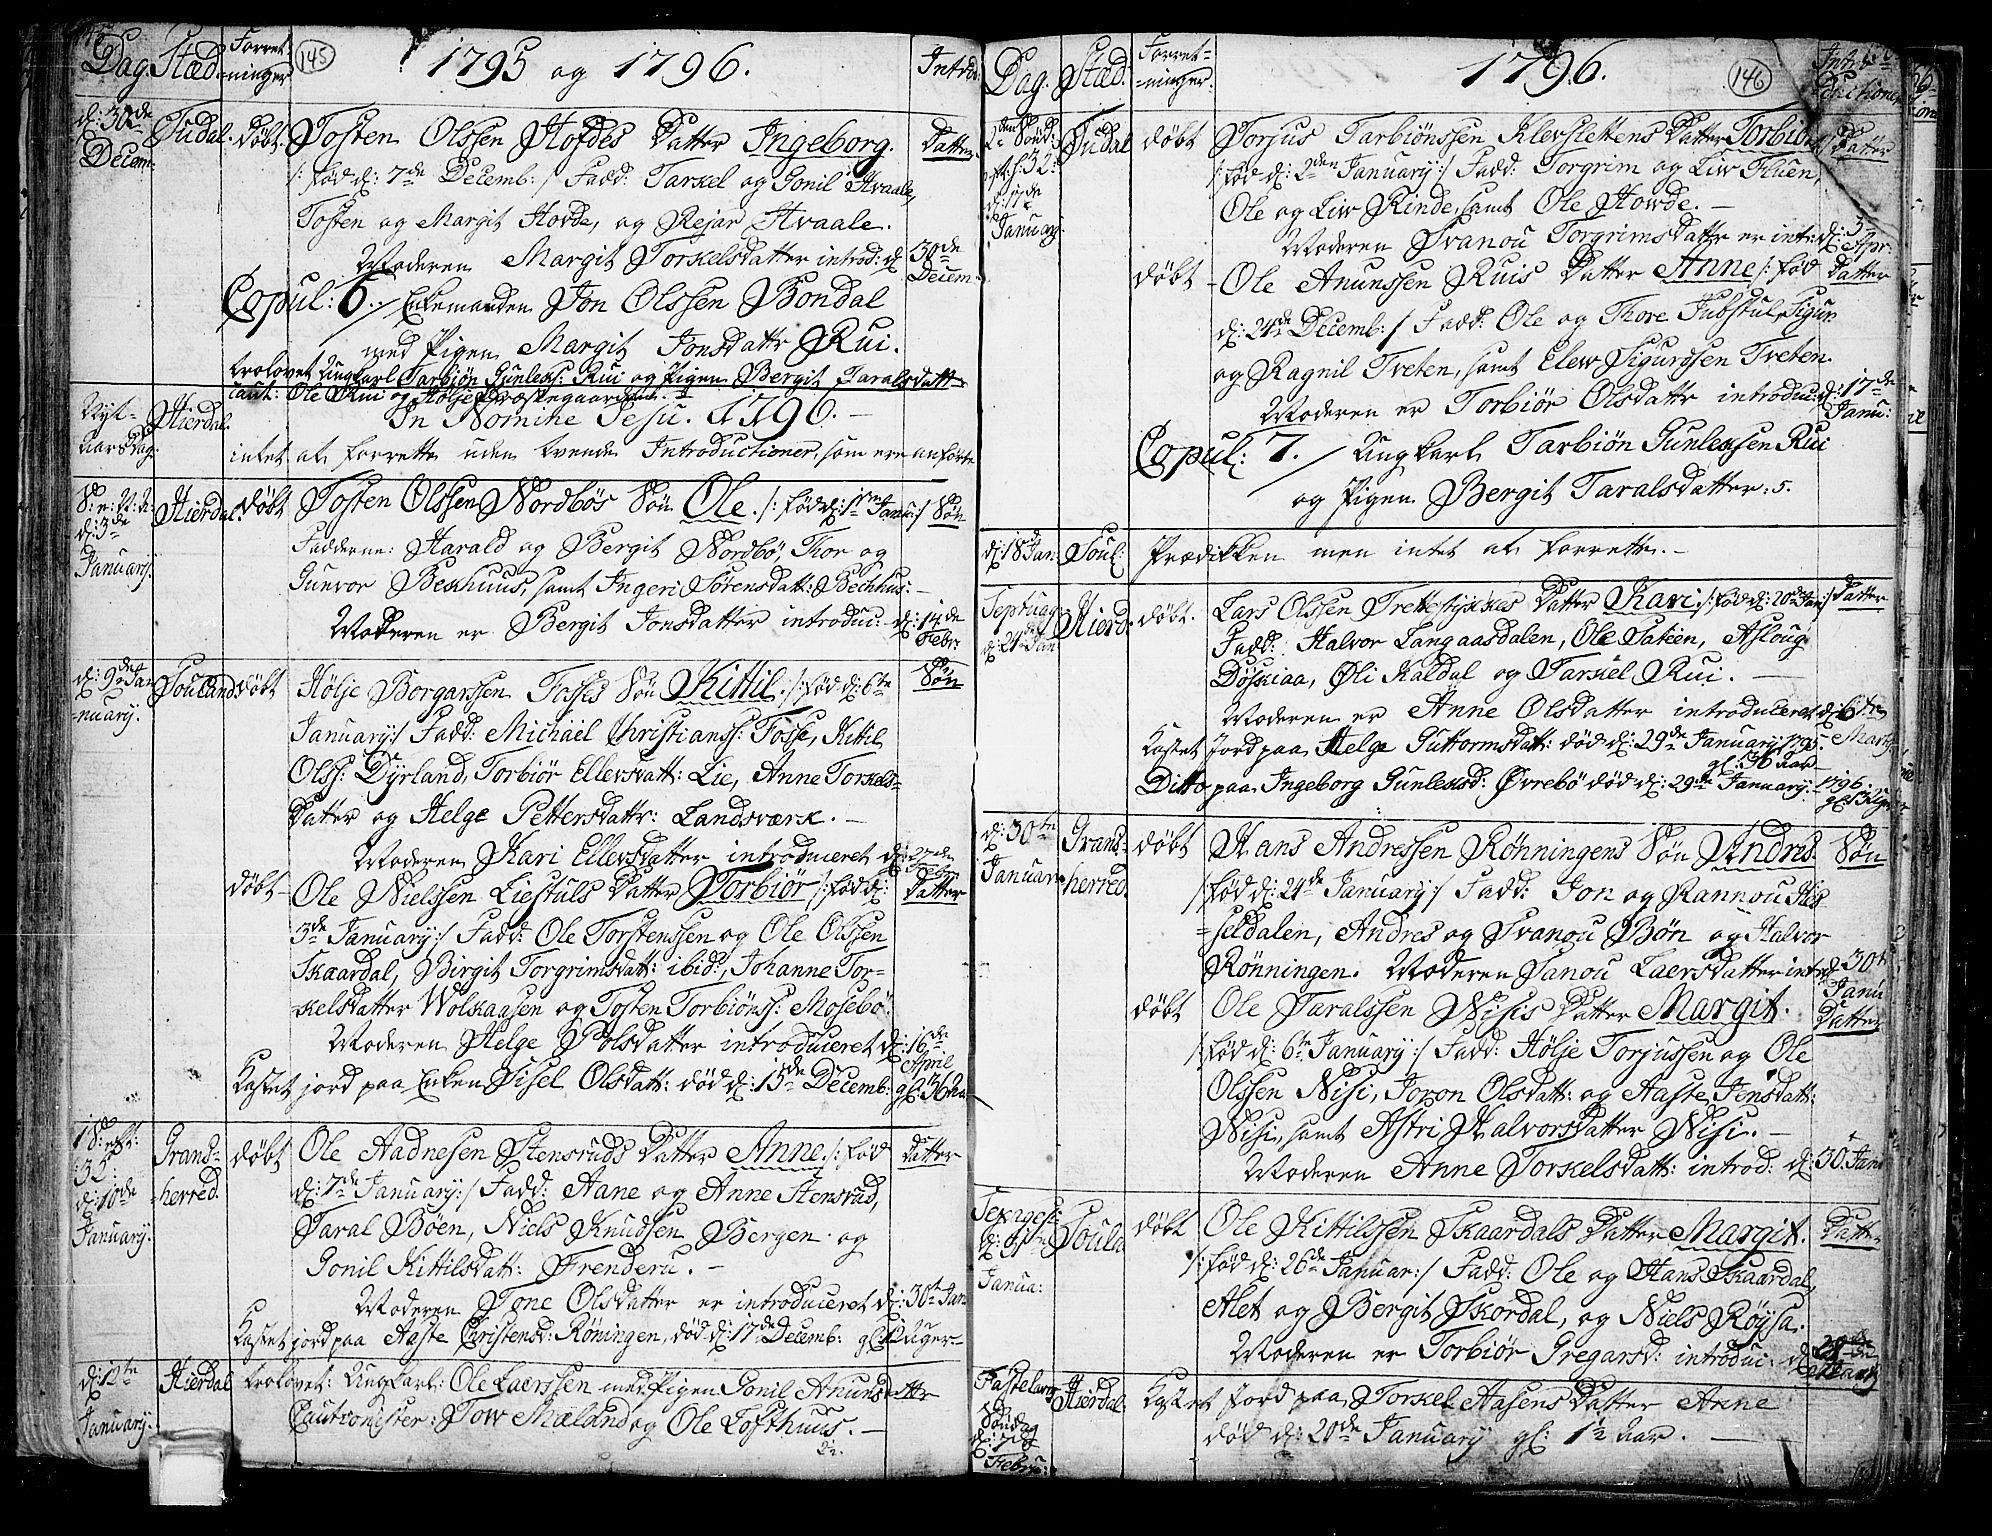 SAKO, Hjartdal kirkebøker, F/Fa/L0005: Ministerialbok nr. I 5, 1776-1801, s. 145-146